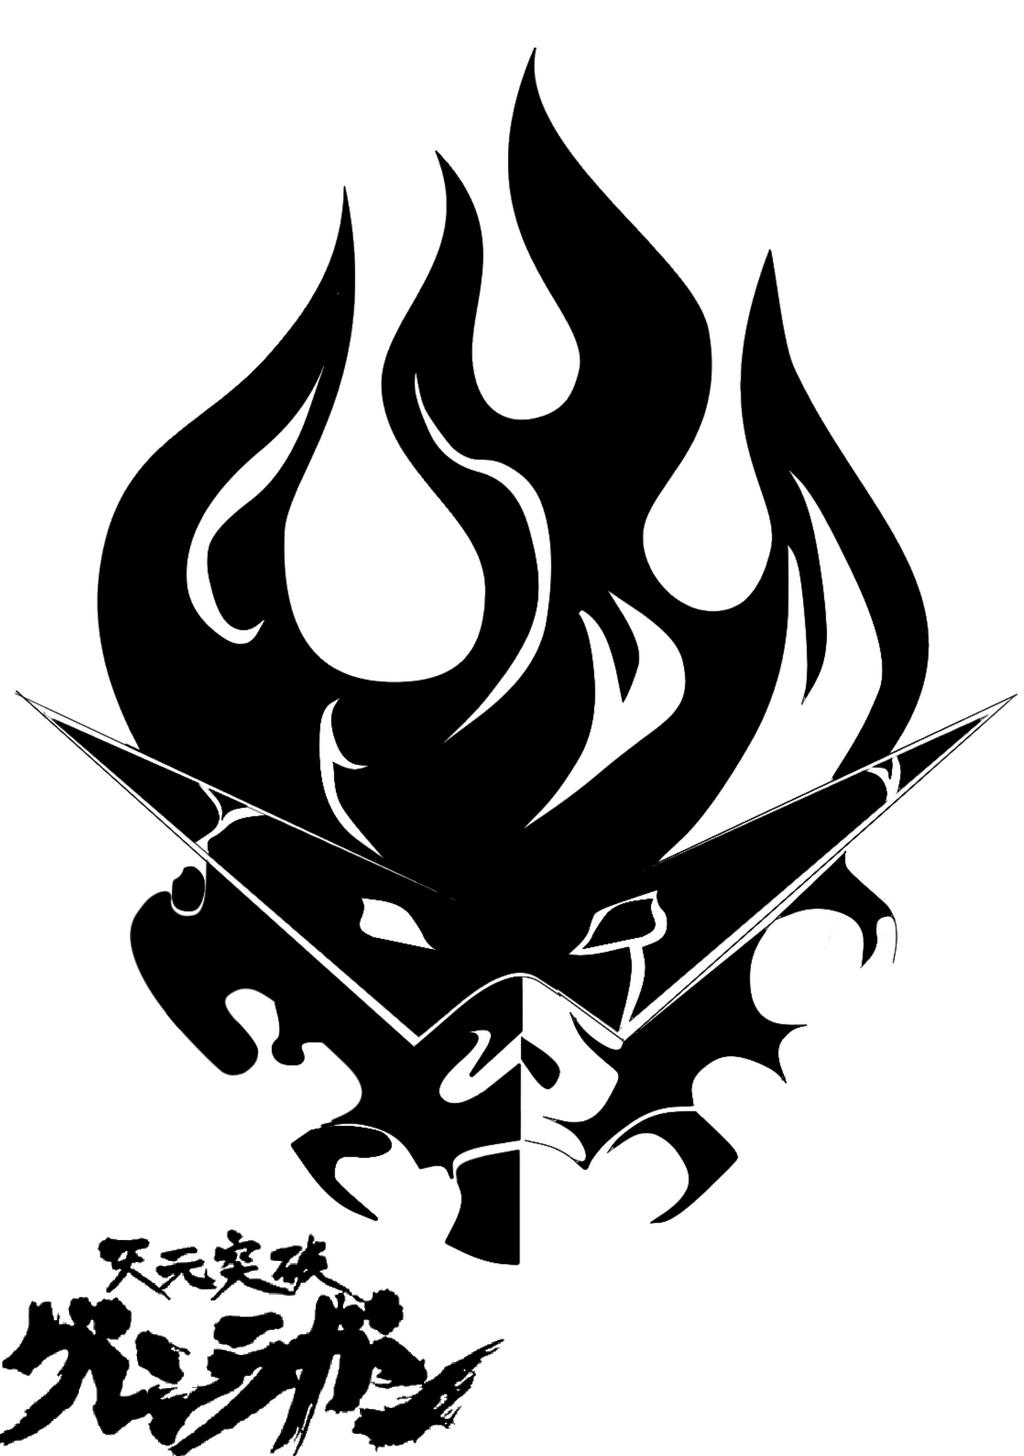 gurren lagann logo by Natsu98jhonny on DeviantArt